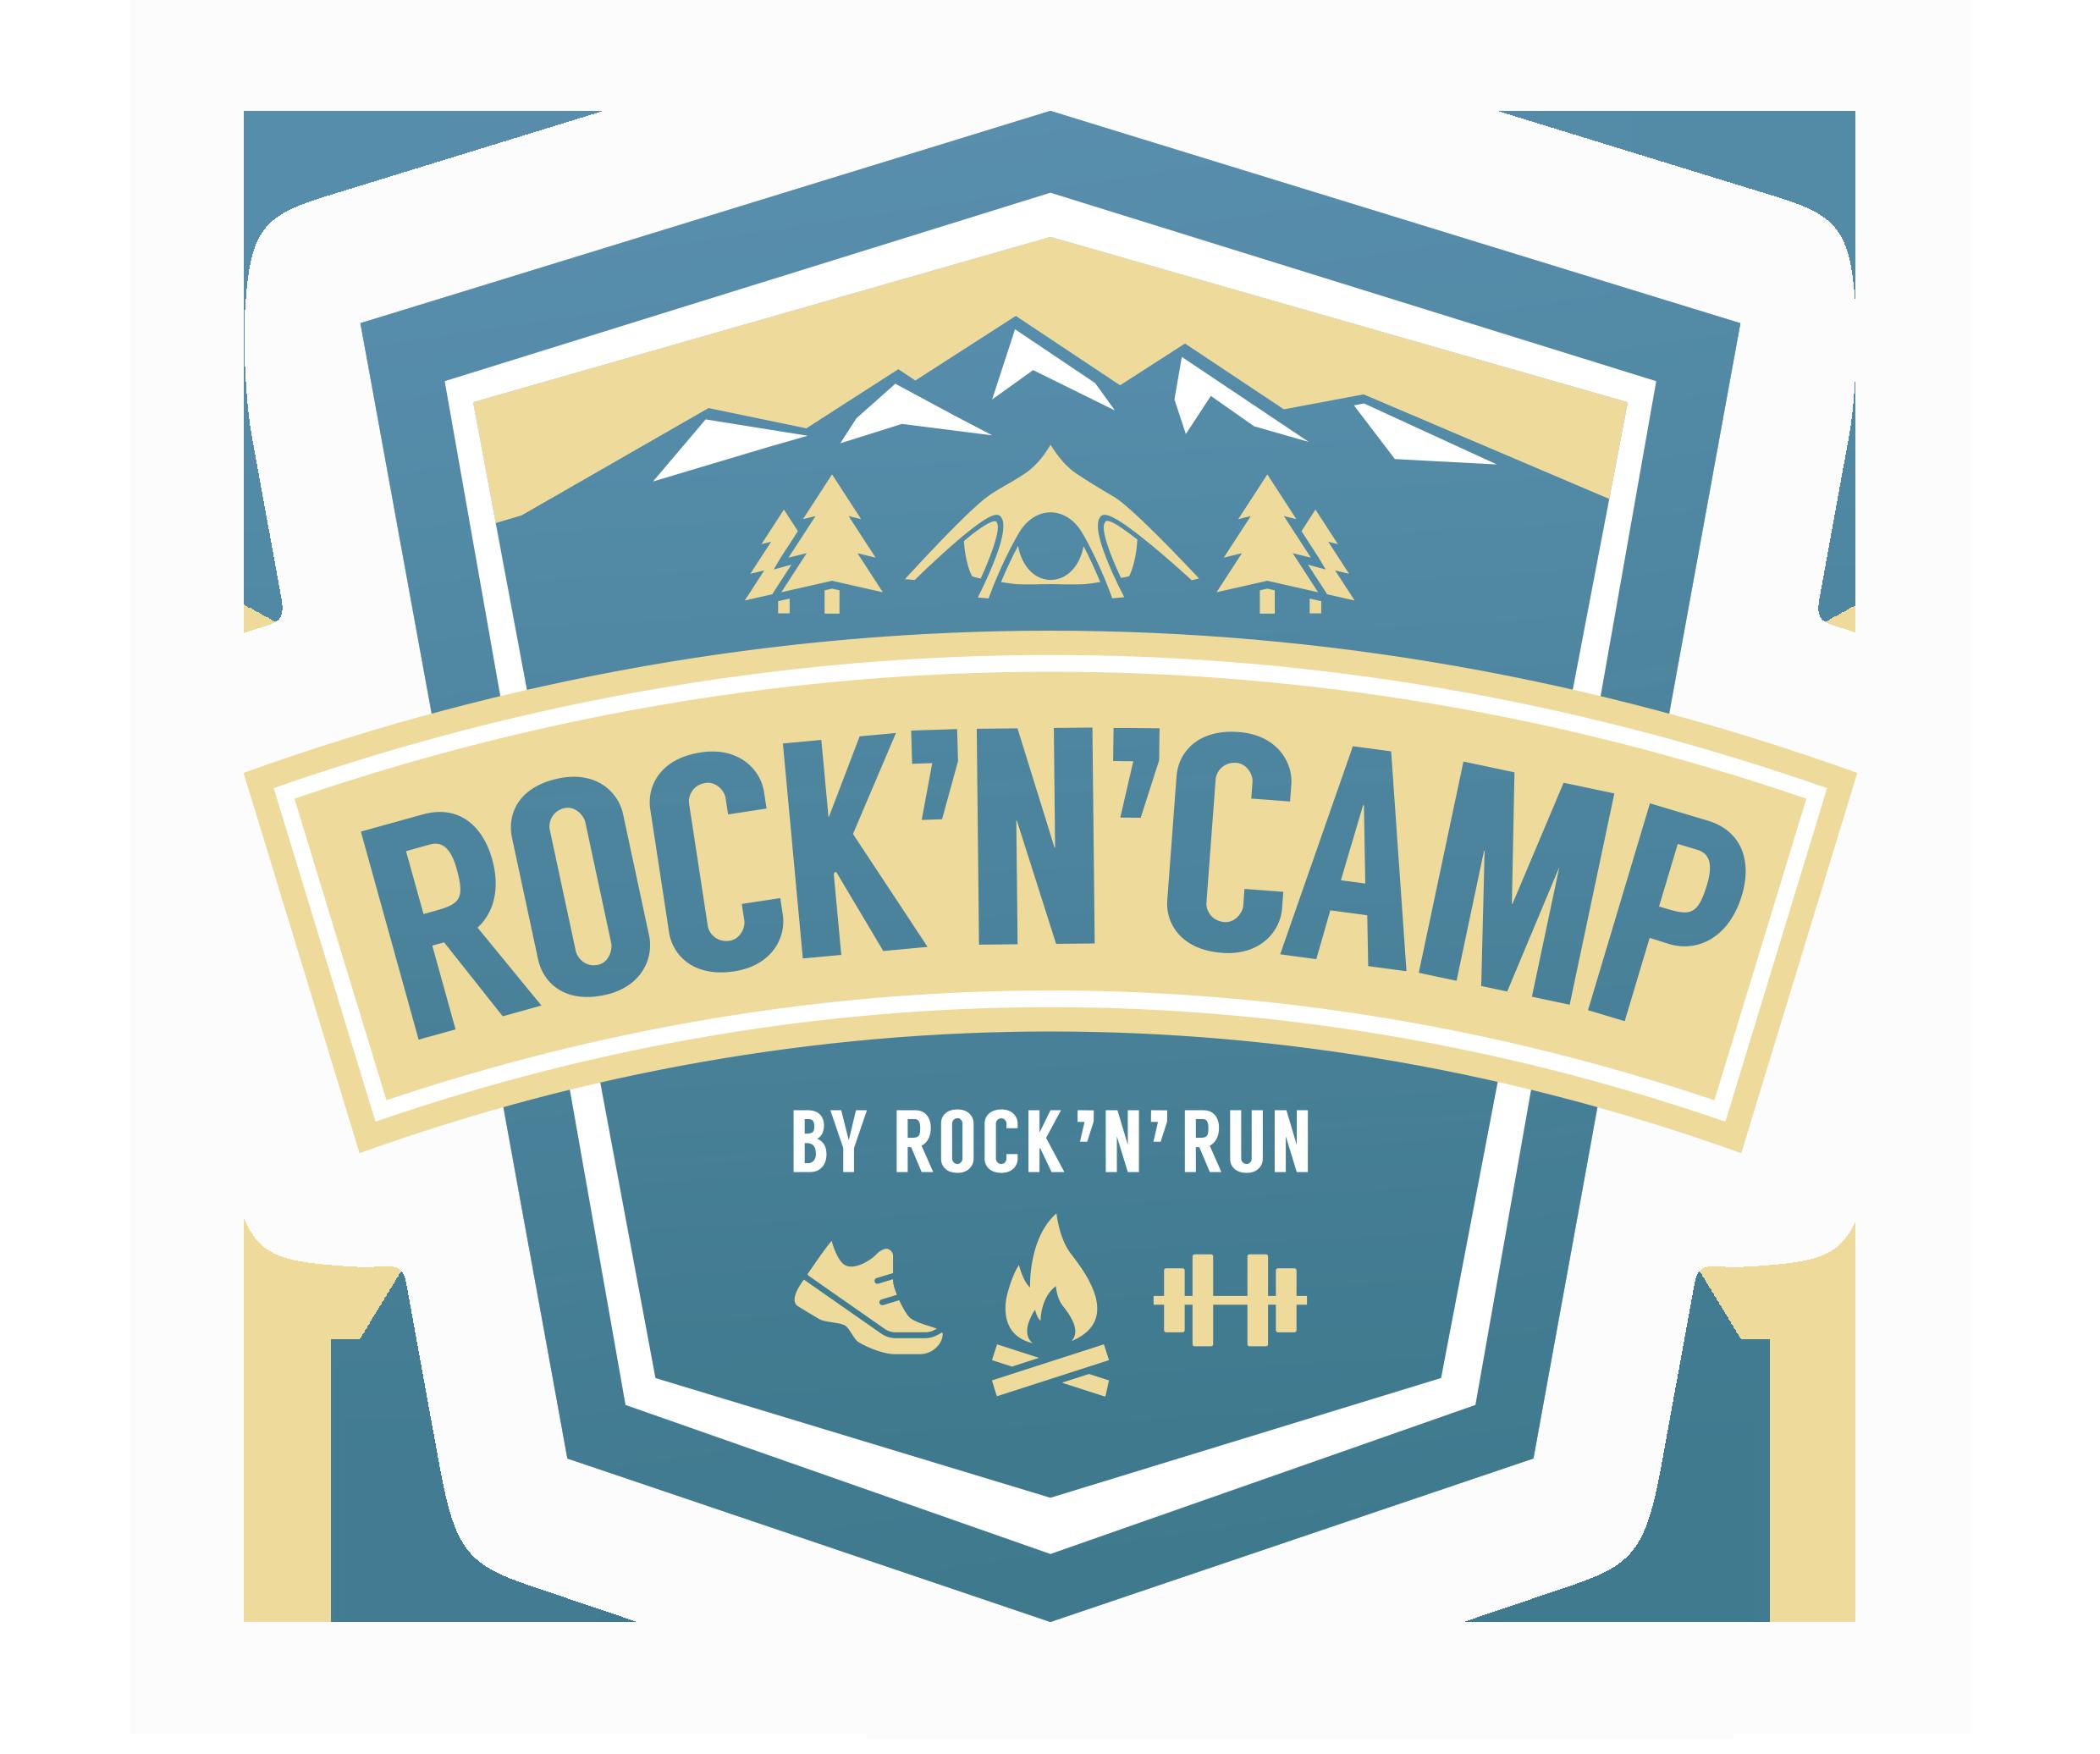 rockncamp_logo_2019_cmyk_2.1.png